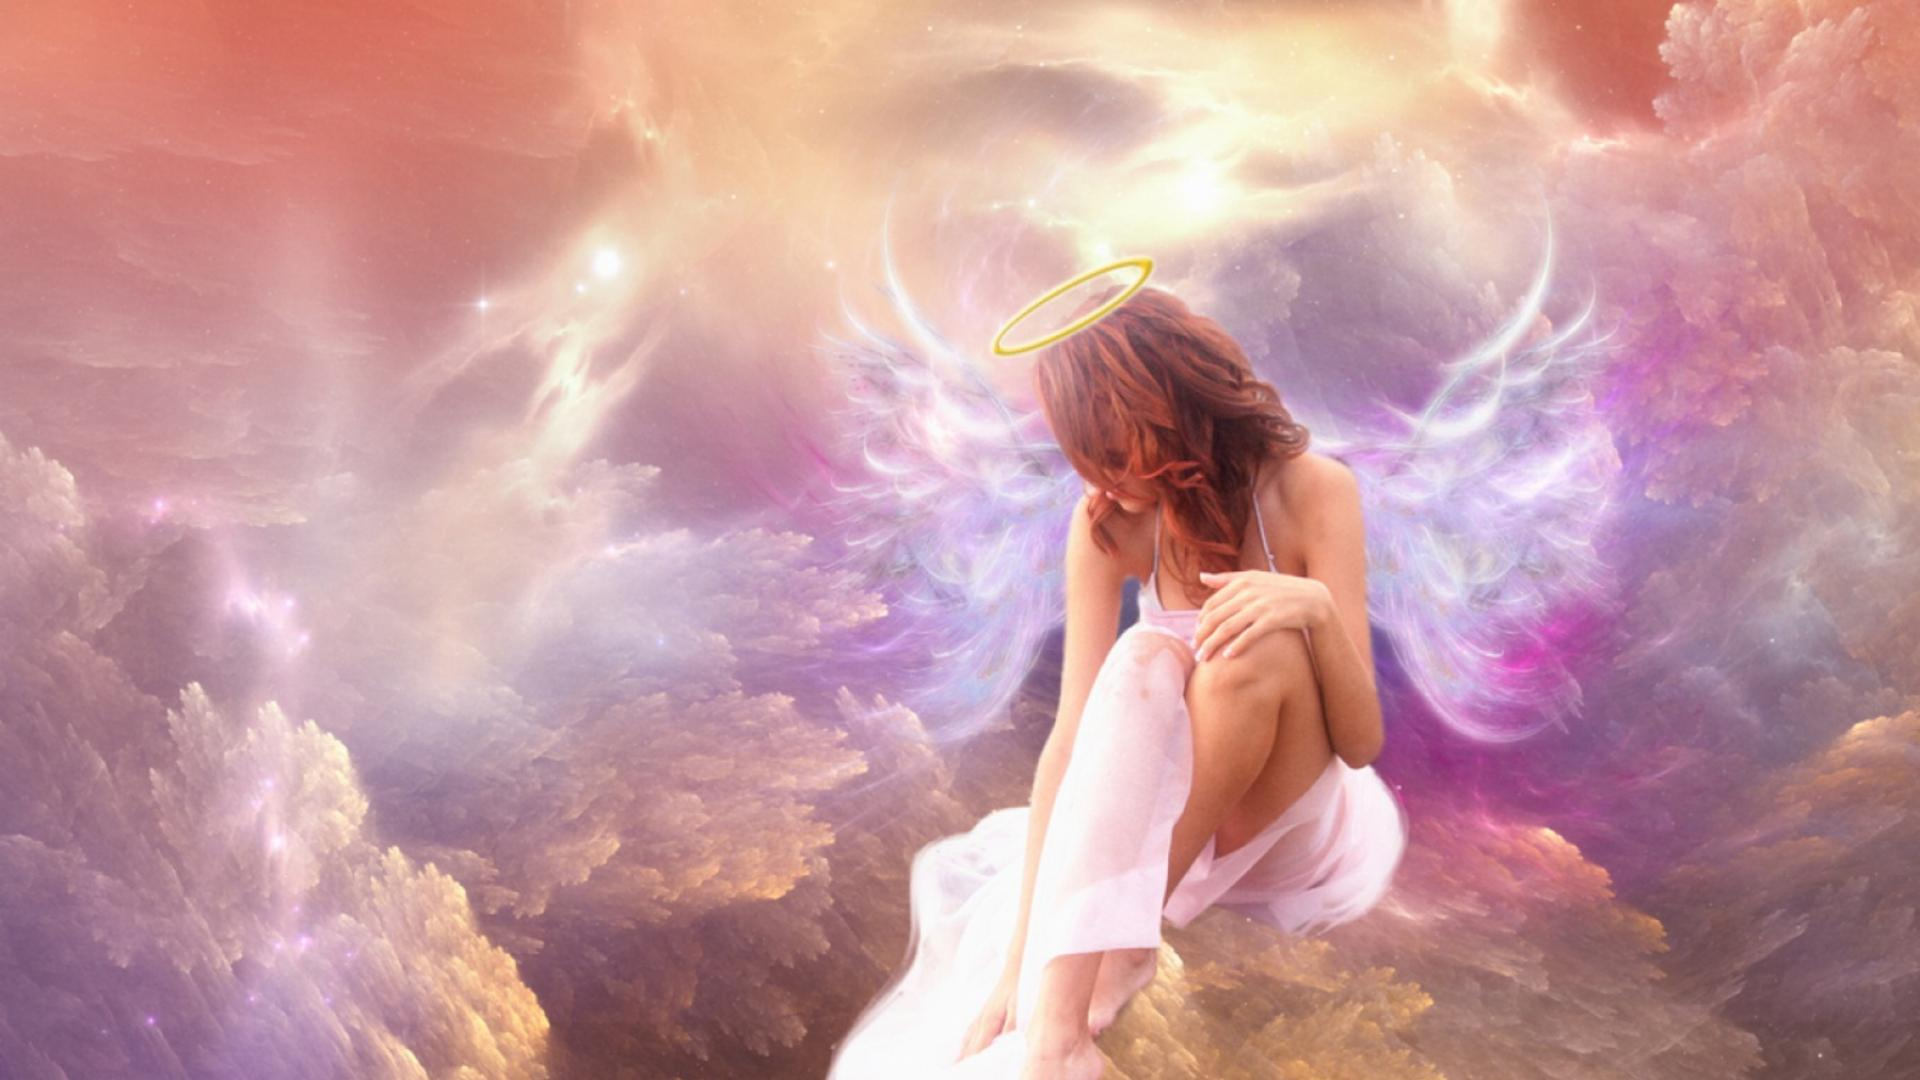 Download Fantasy Angel Wallpaper 1920x1080 122256 Full Size 1920x1080